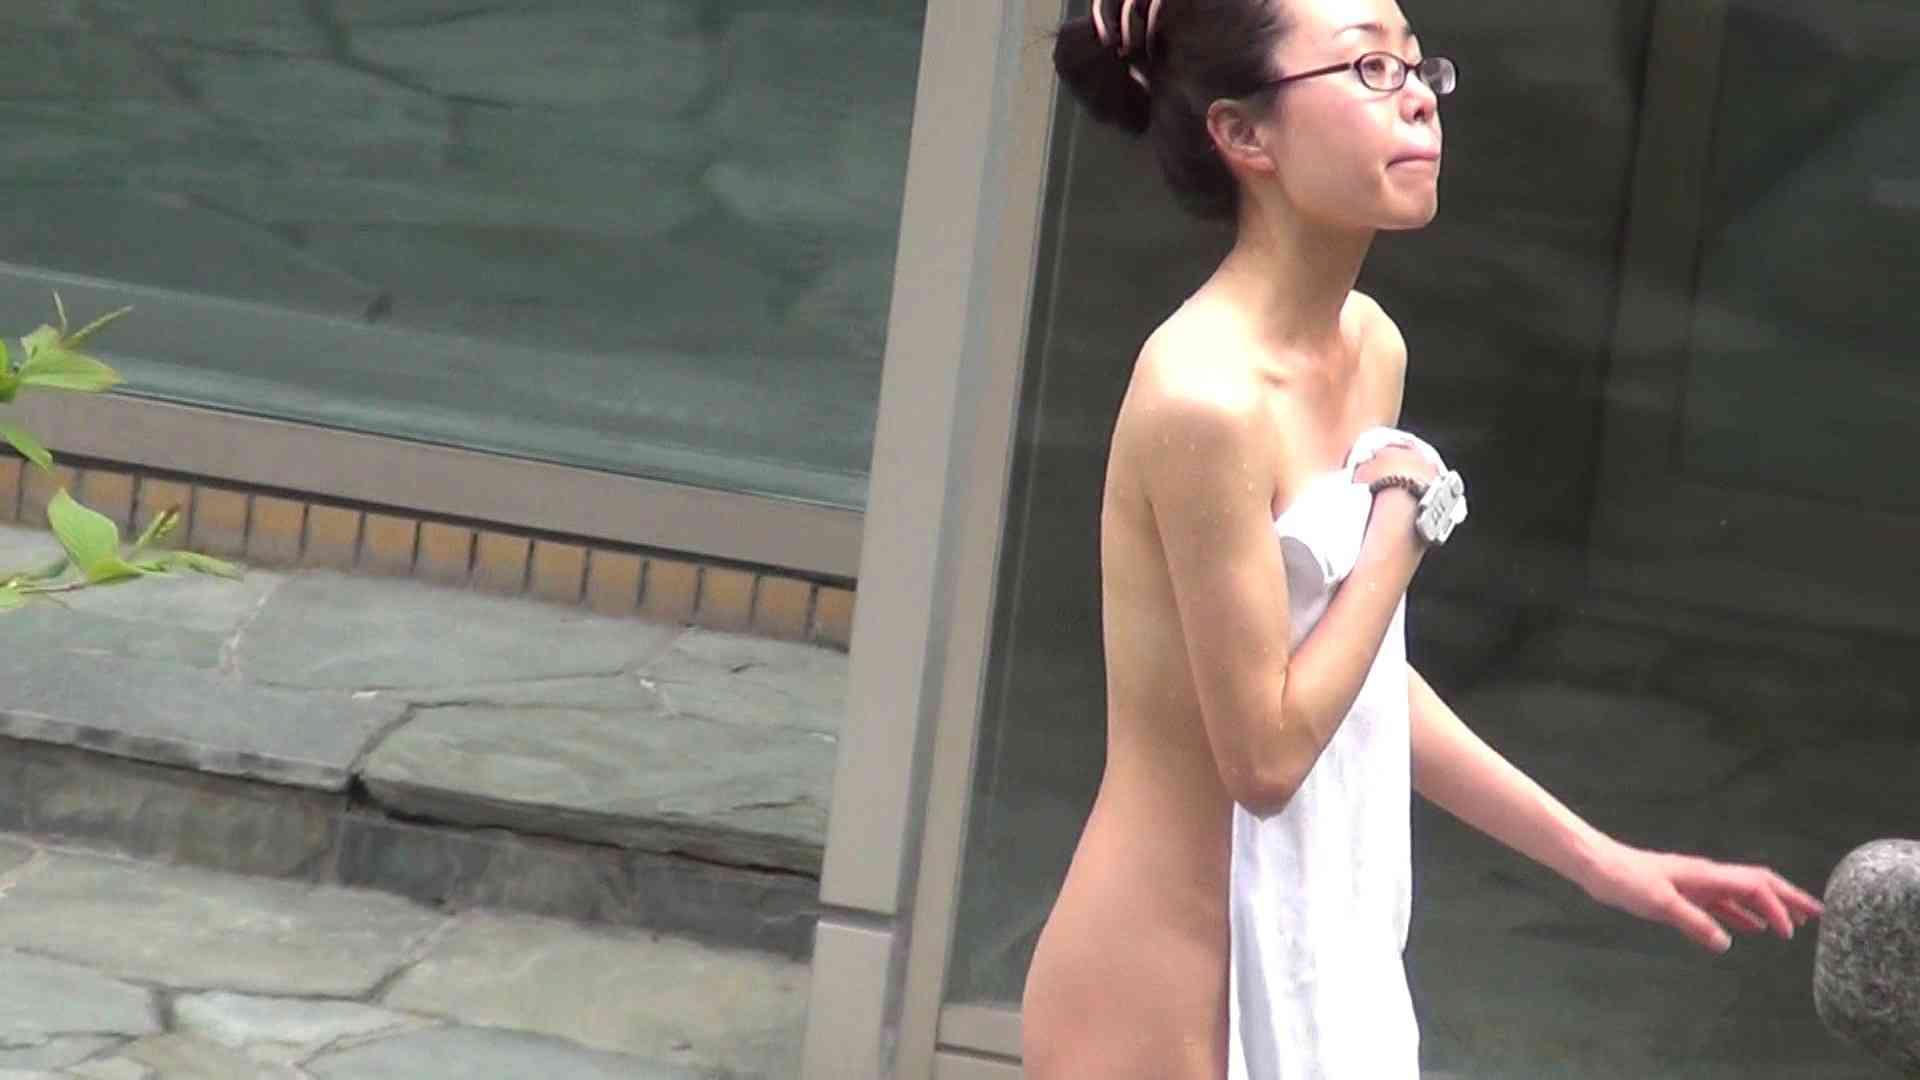 Aquaな露天風呂Vol.232 盗撮 | HなOL  81pic 47